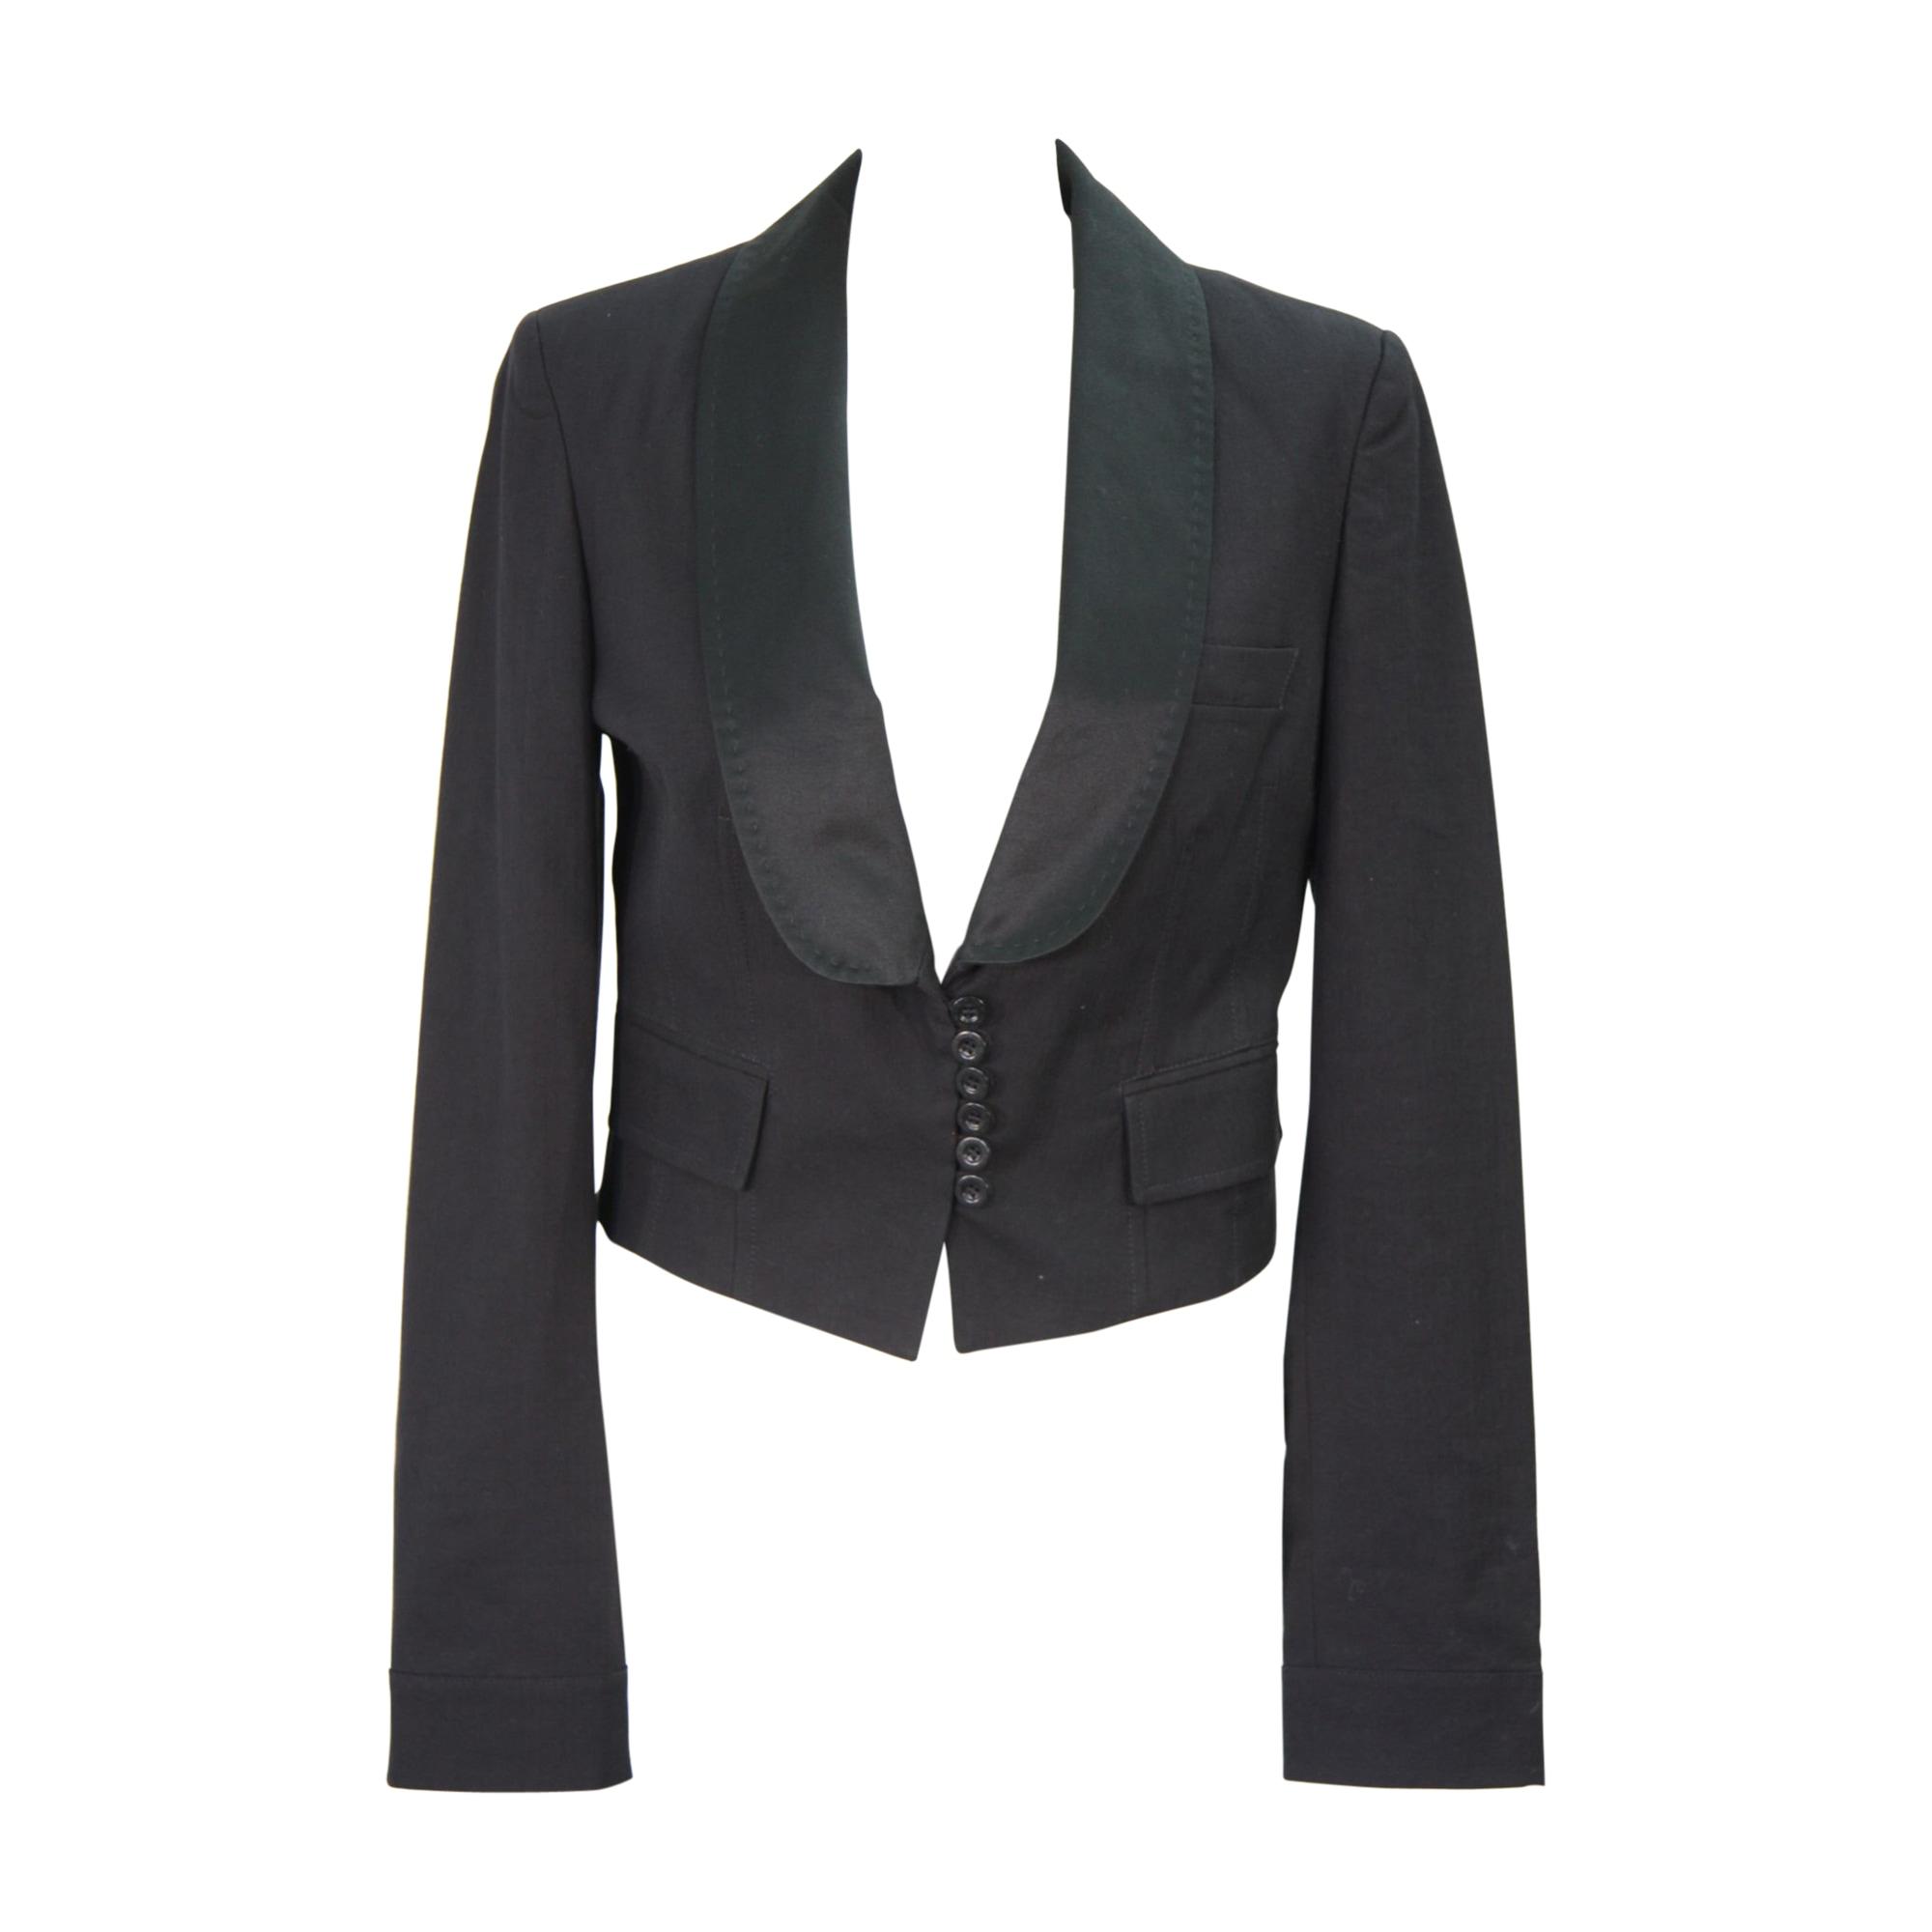 Blazer, veste tailleur SEE BY CHLOE Noir